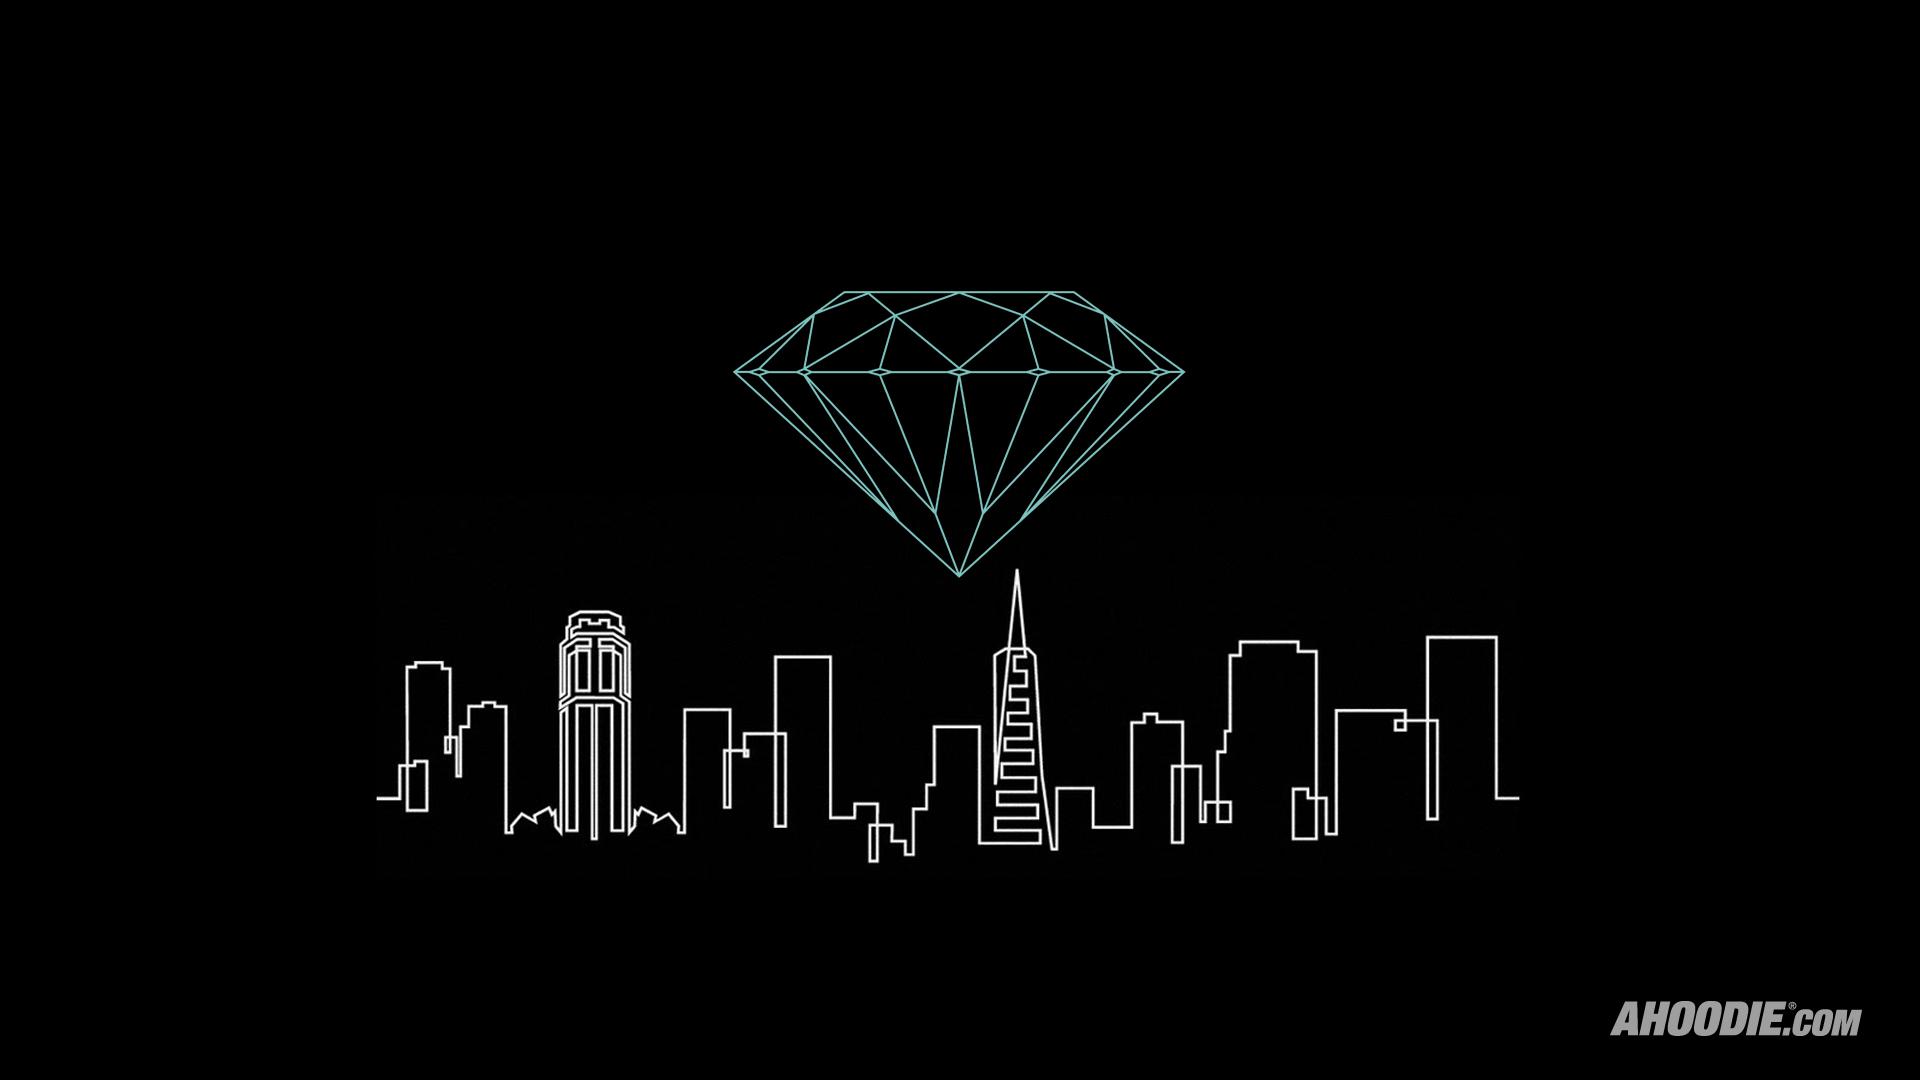 diamond supply co been trill wallpaper diamond supply co wallpaper hd 1920x1080